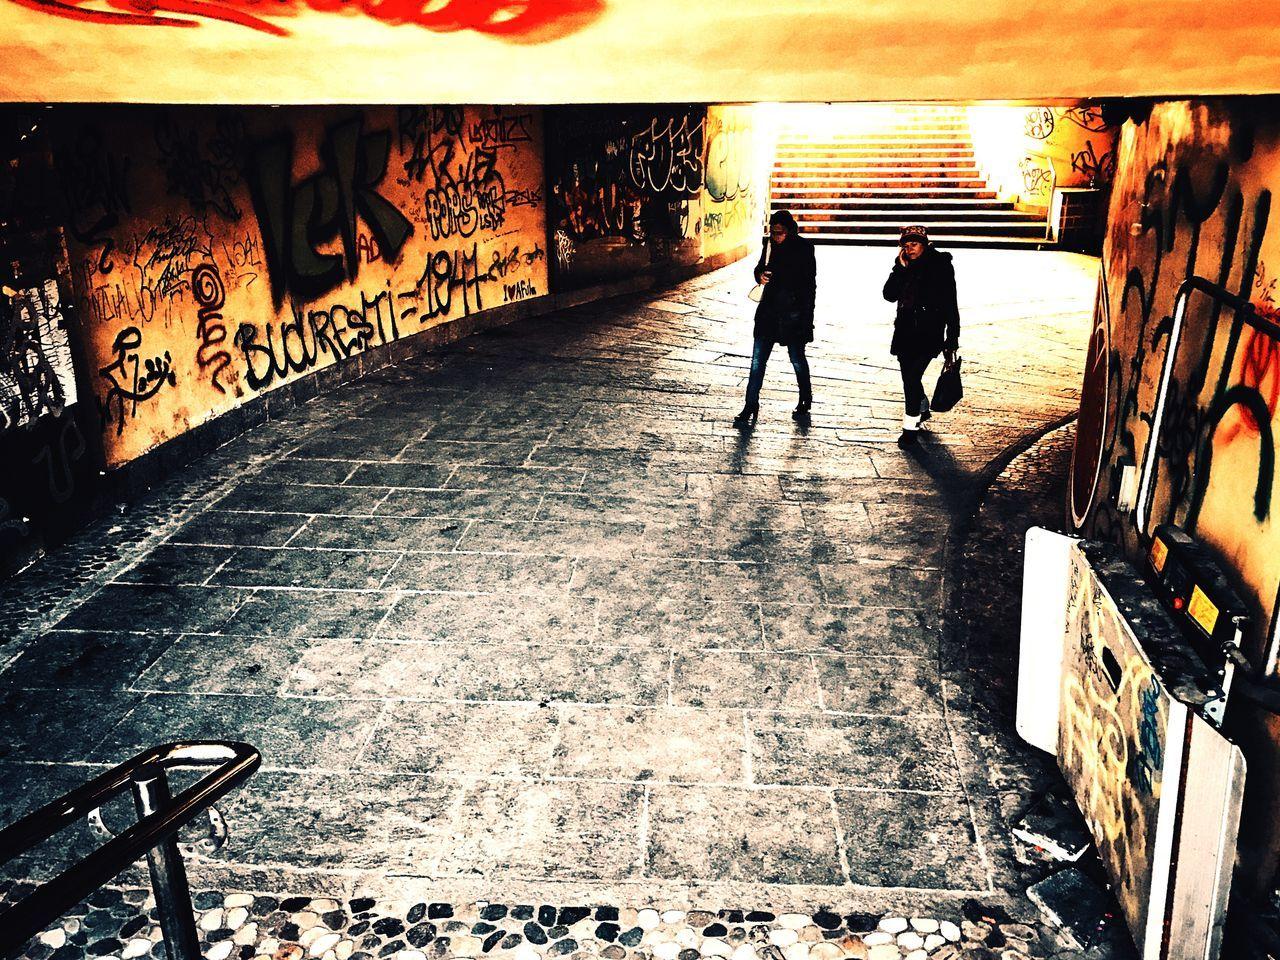 Real People Walking Women Lifestyles Built Structure Steps Subway Underground Passage Working Day Inertia Bucharest